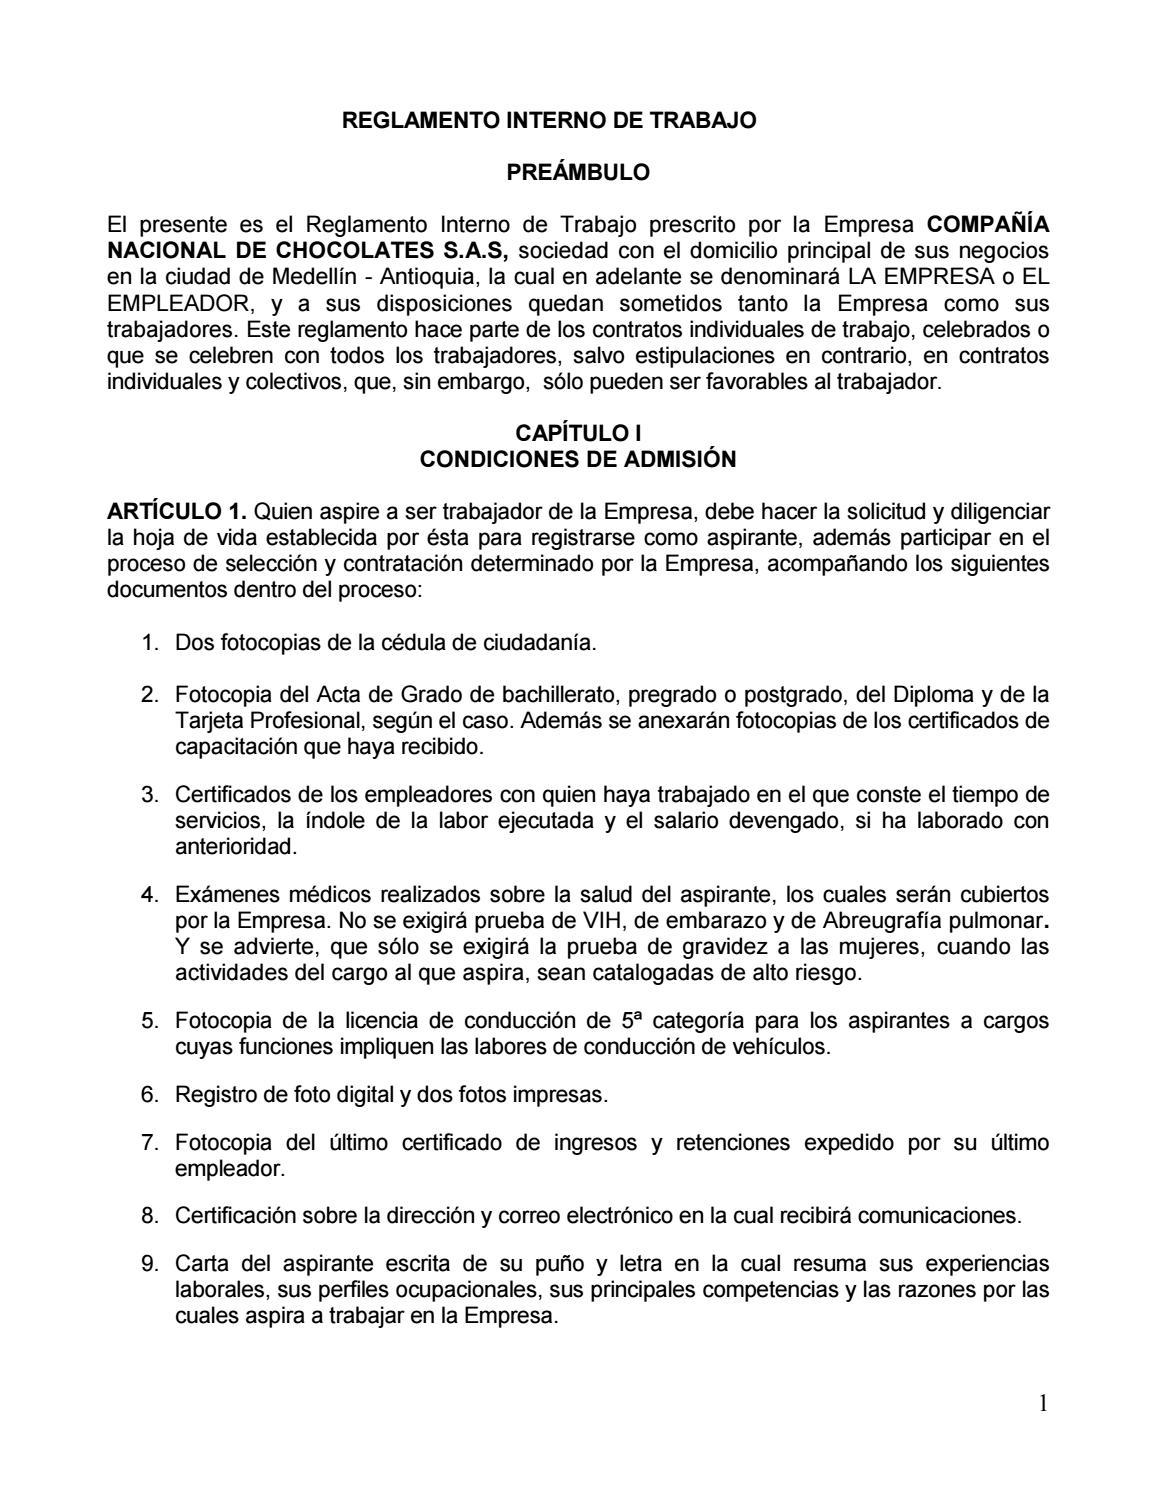 Reglamento interno by comunicacioneschocolates - issuu